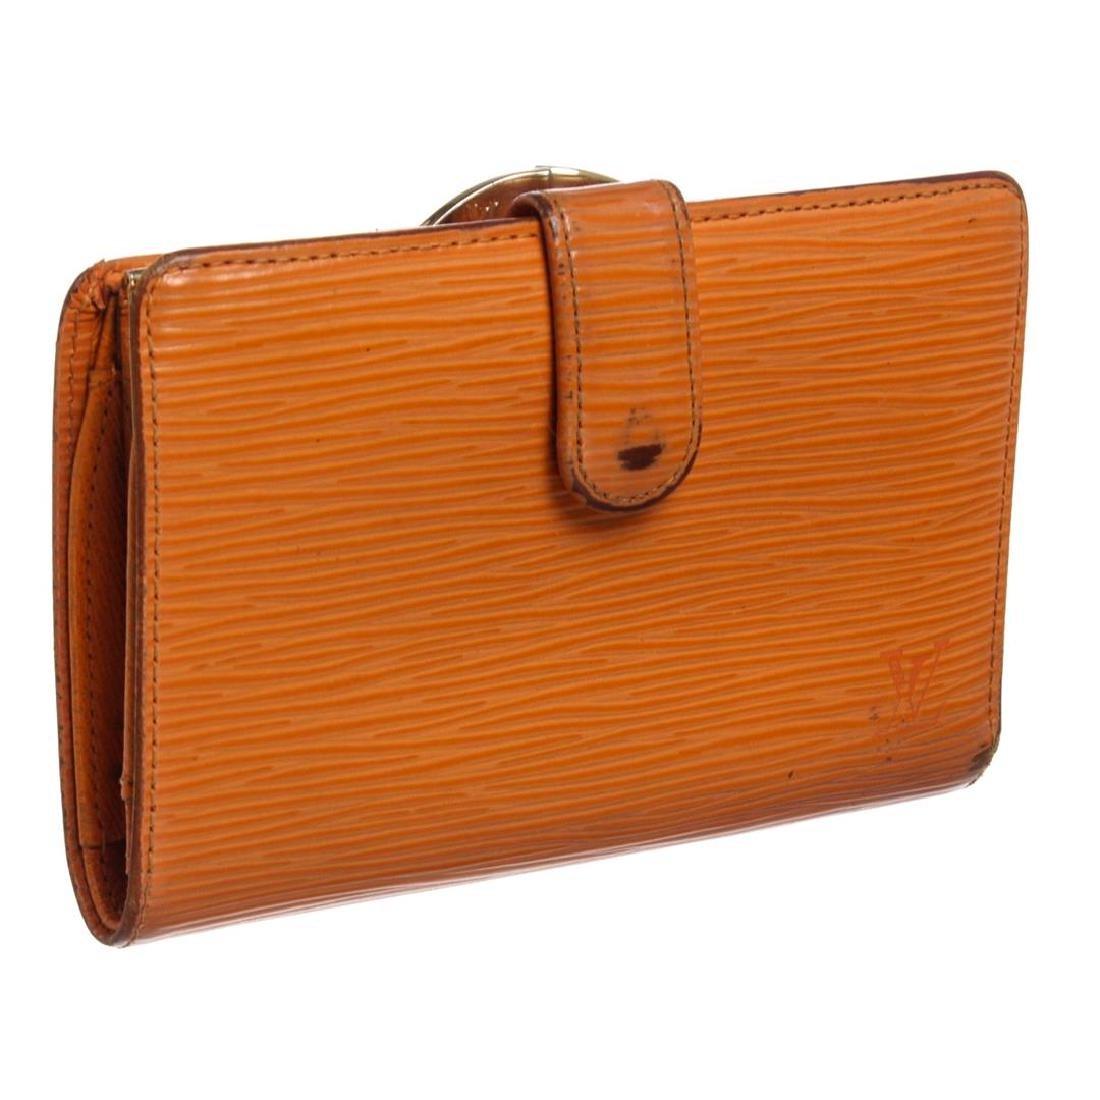 Louis Vuitton Orange Epi Leather French Purse Wallet - 3